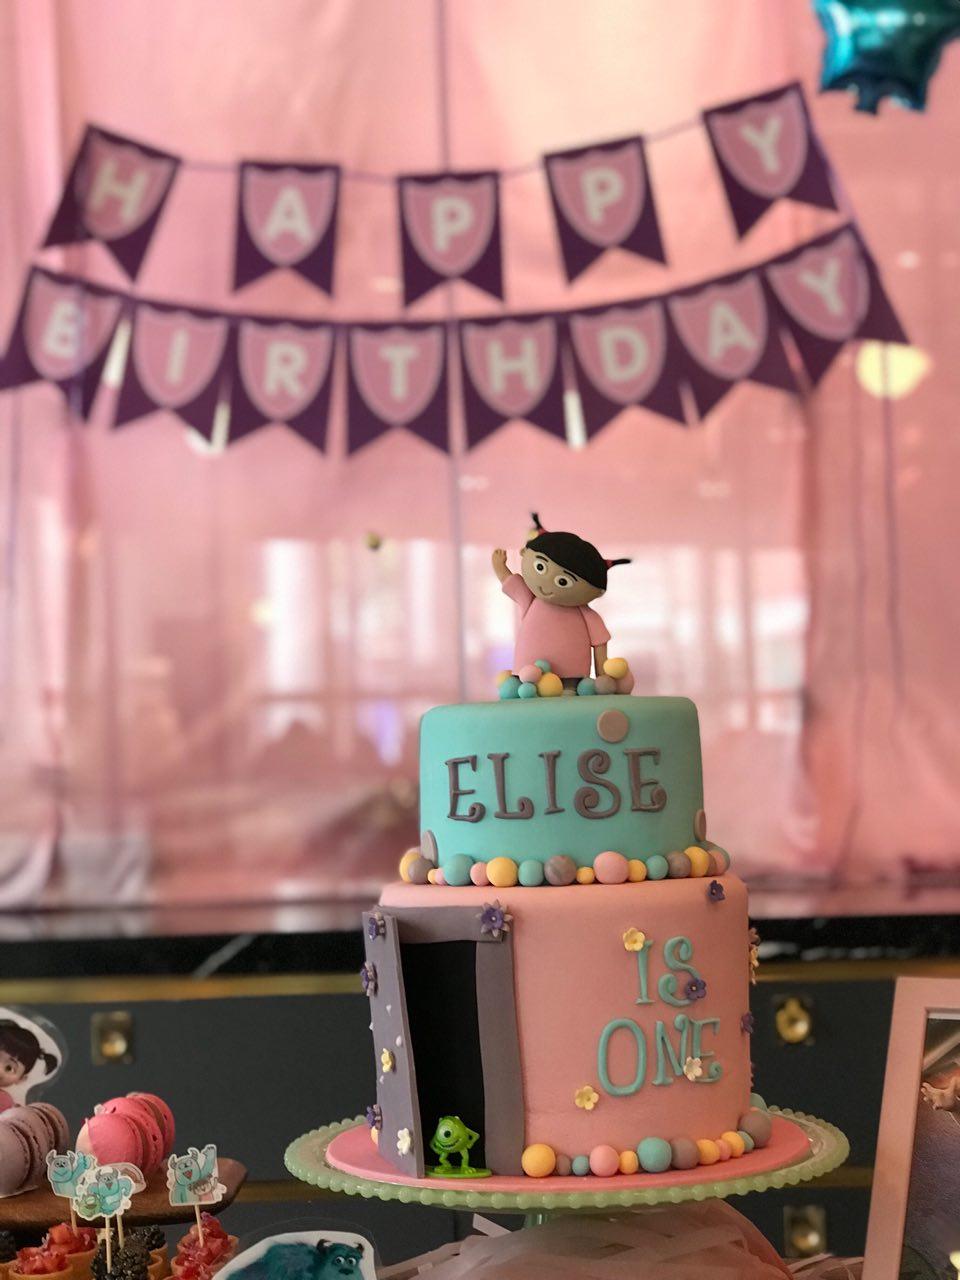 Kids-birthday-venuerific-blog-monsters-inc-decorations